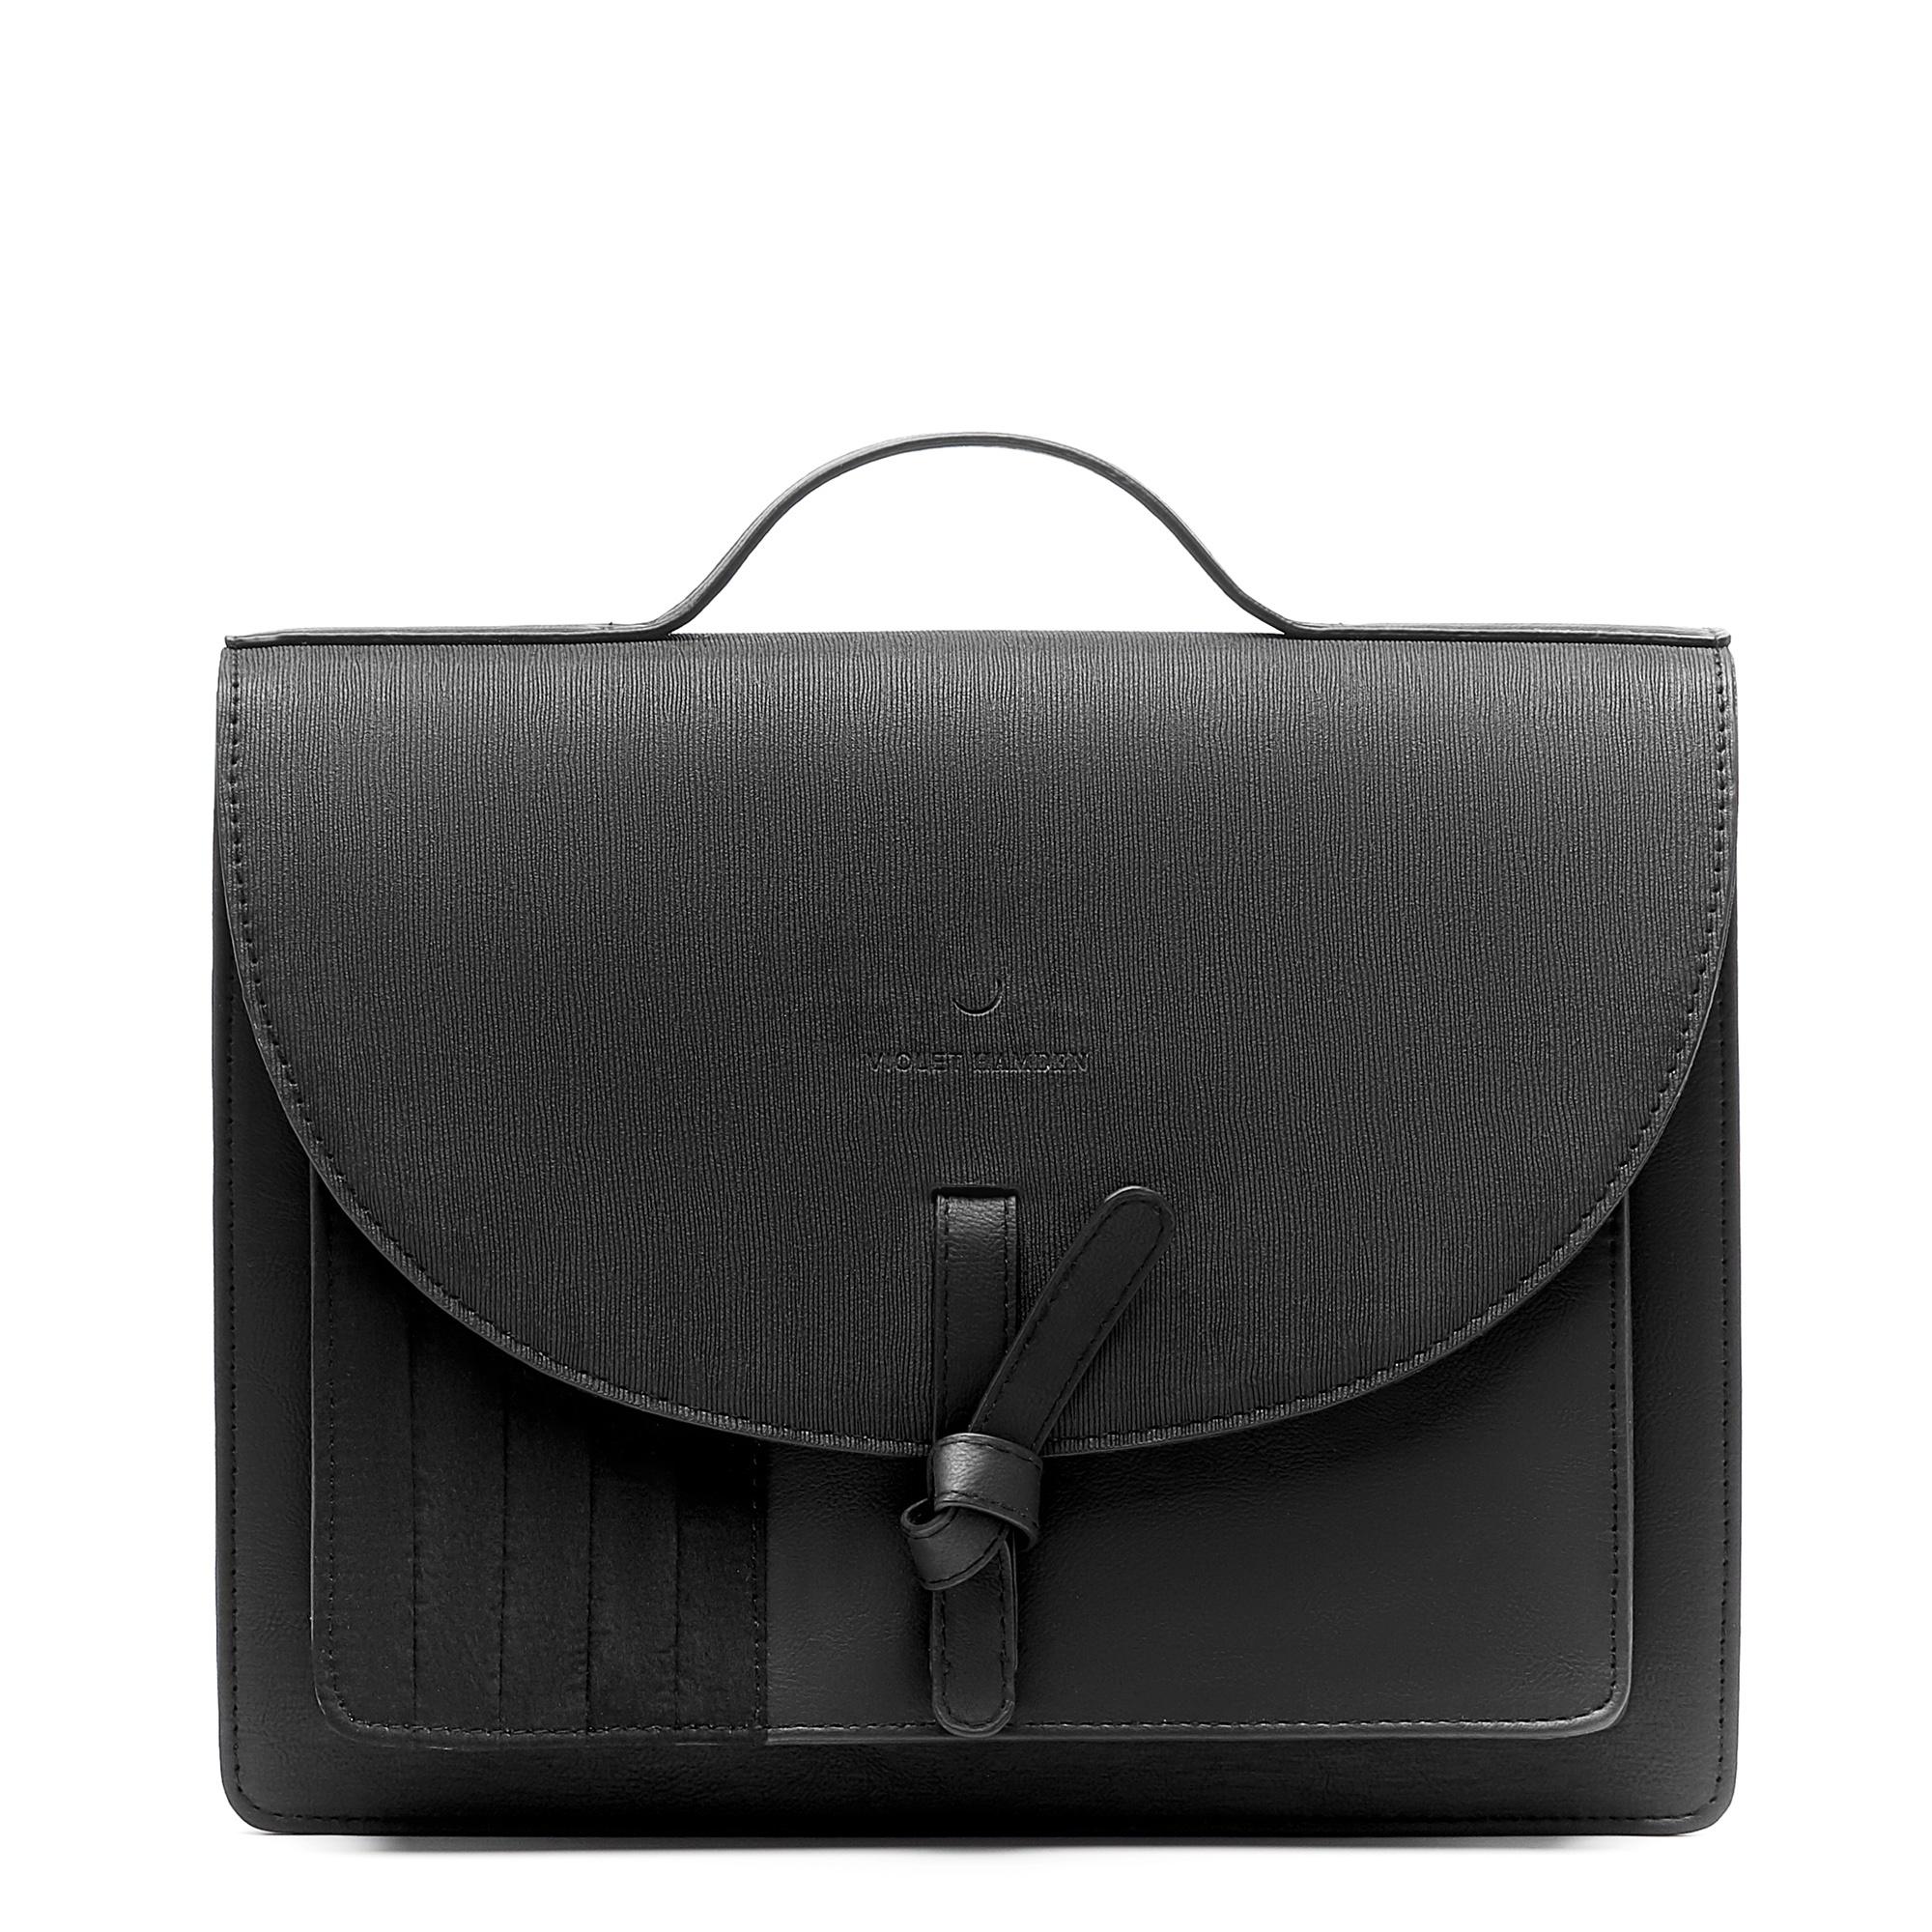 Violet Hamden Essential Bag black crossbody bag